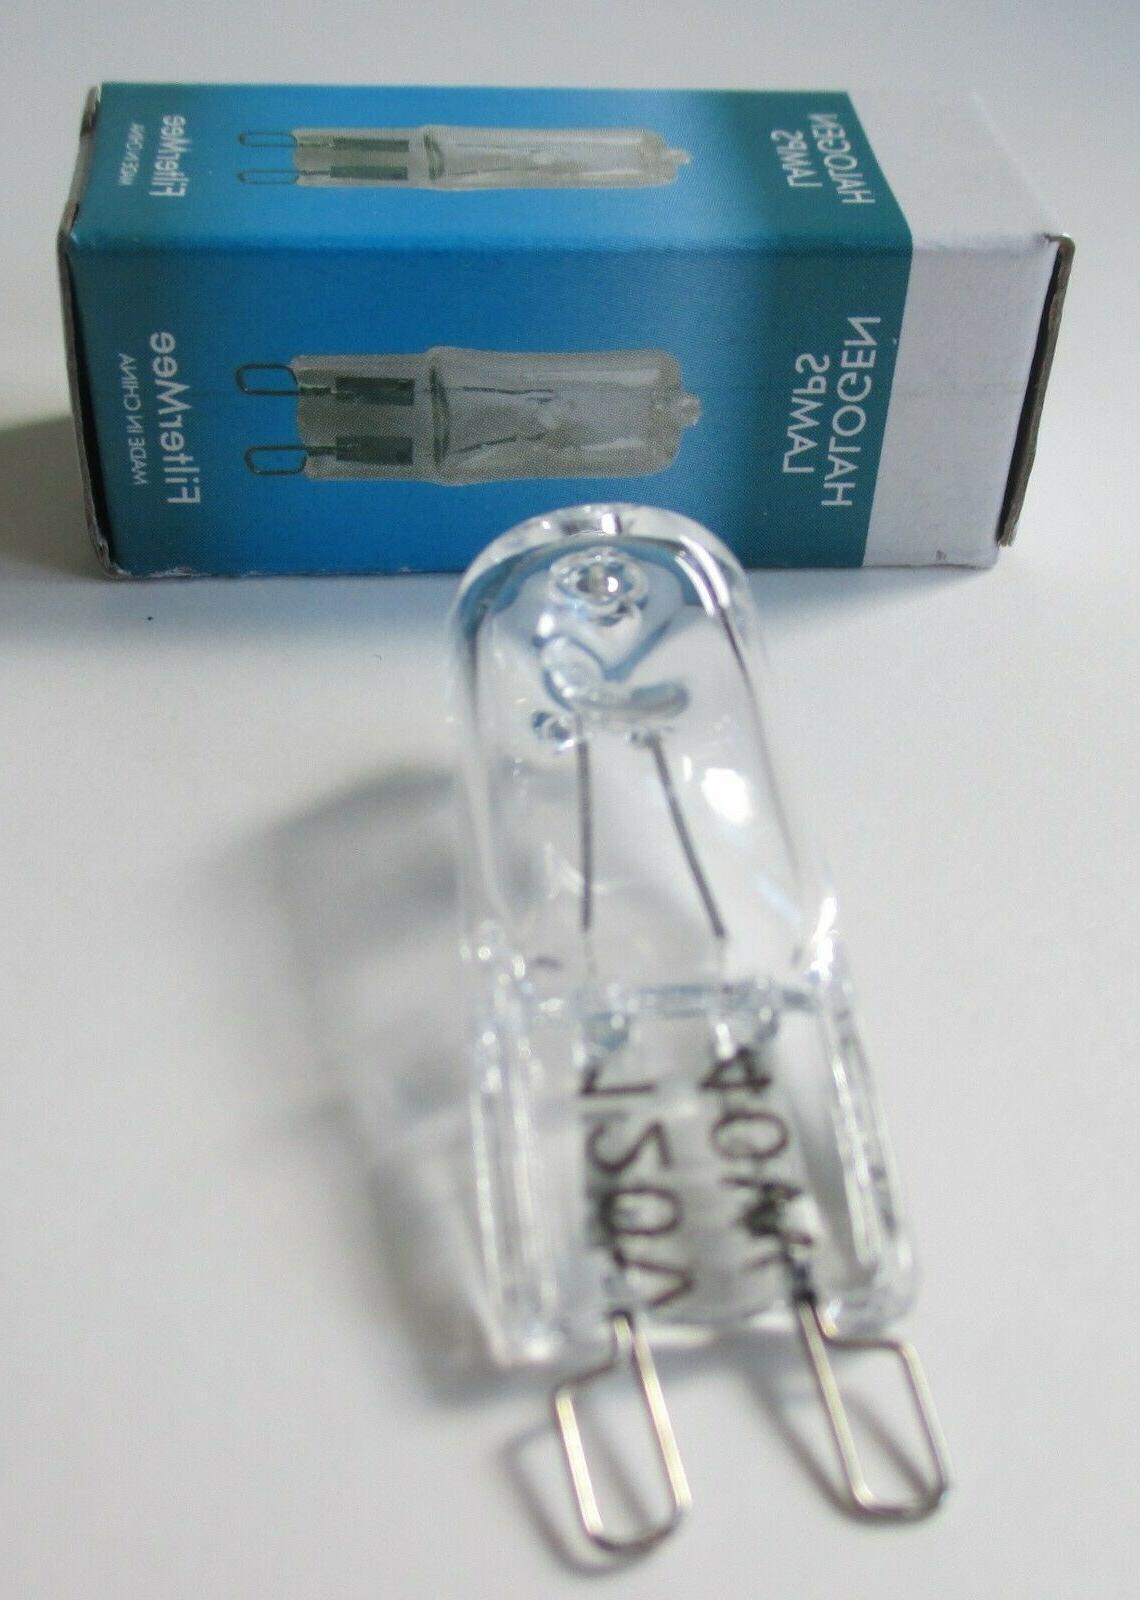 2 Bulbs G9 for GE Kitchenaid Microwave